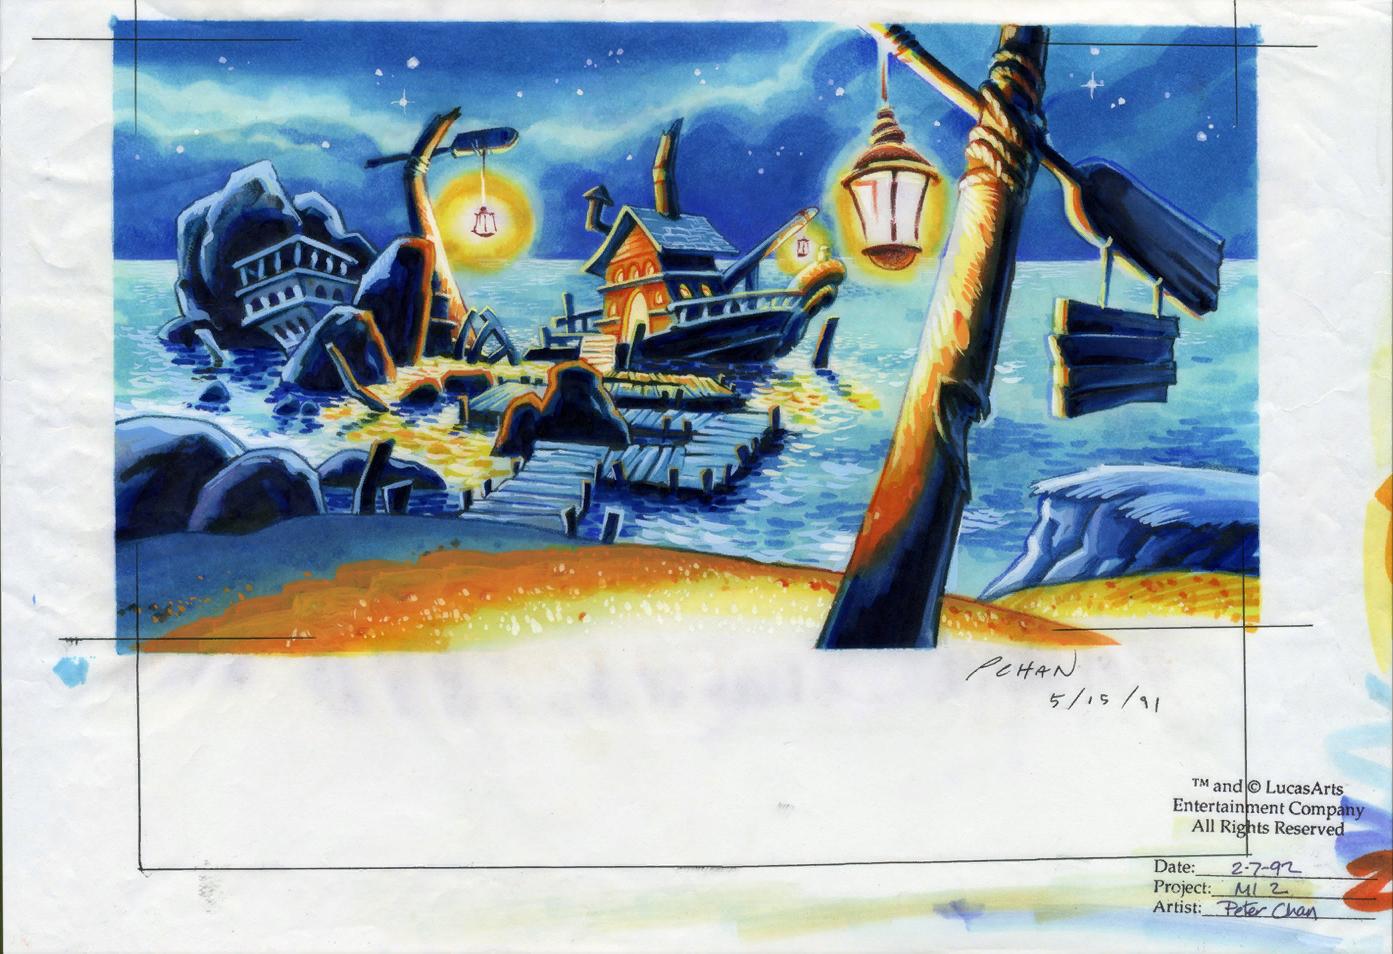 Monkey island 2 lechuck s revenge concept art the international - An Alternate Background Design For Captain Dread S Ship Moored At Scabb Island Here